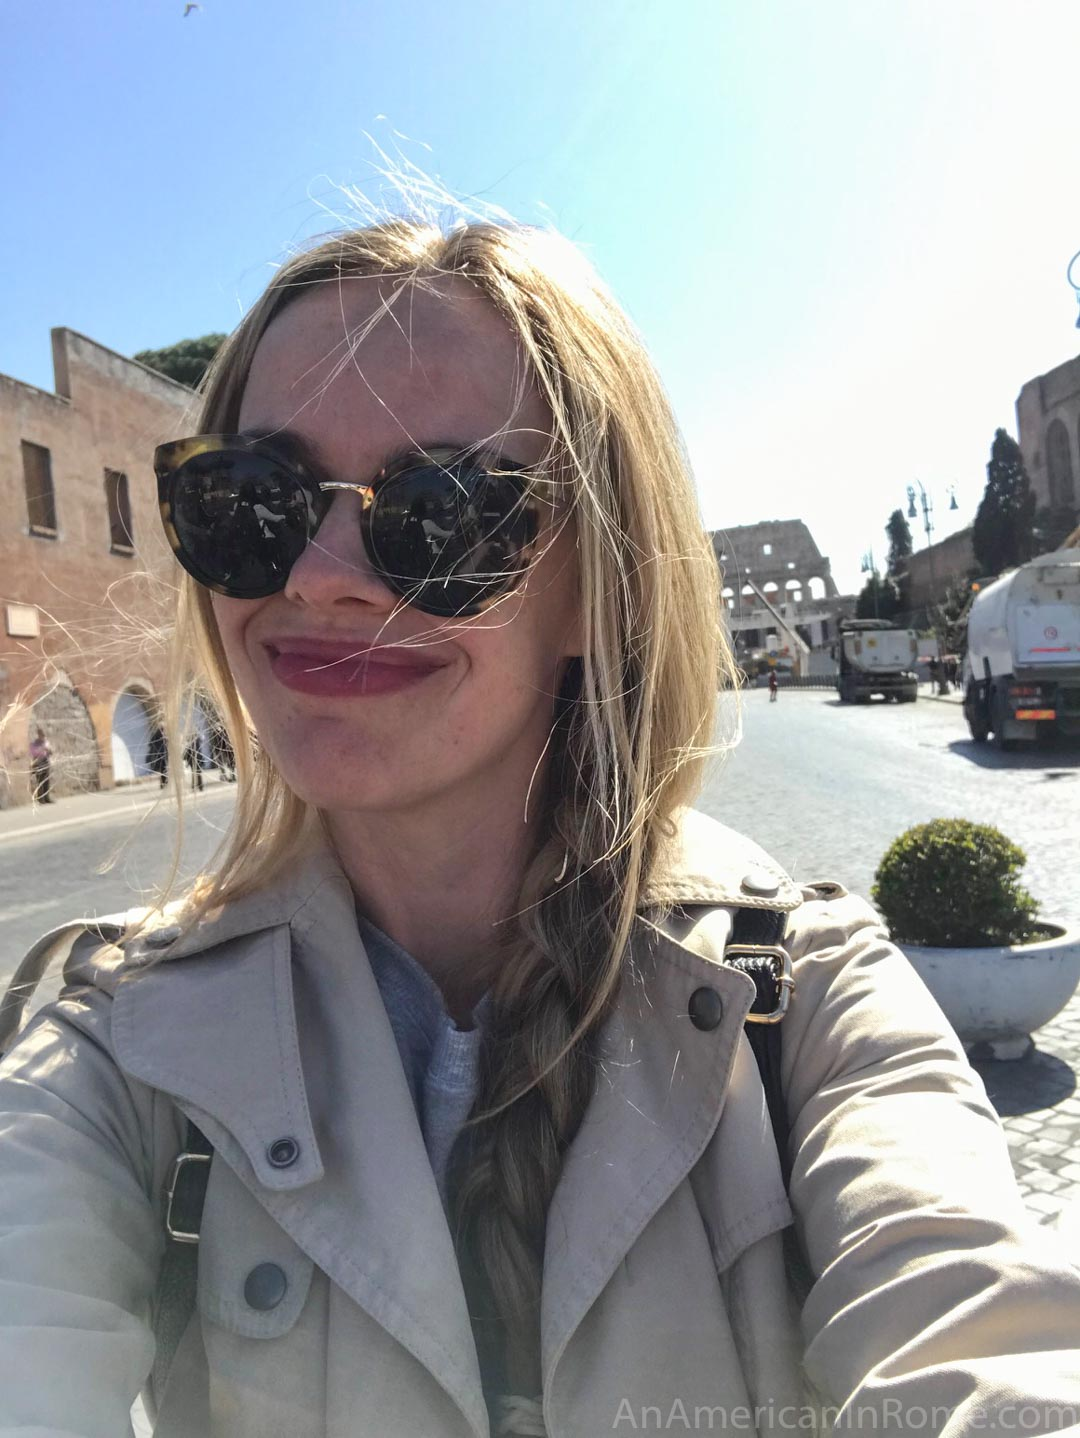 Smiling woman selfie in sunglasses